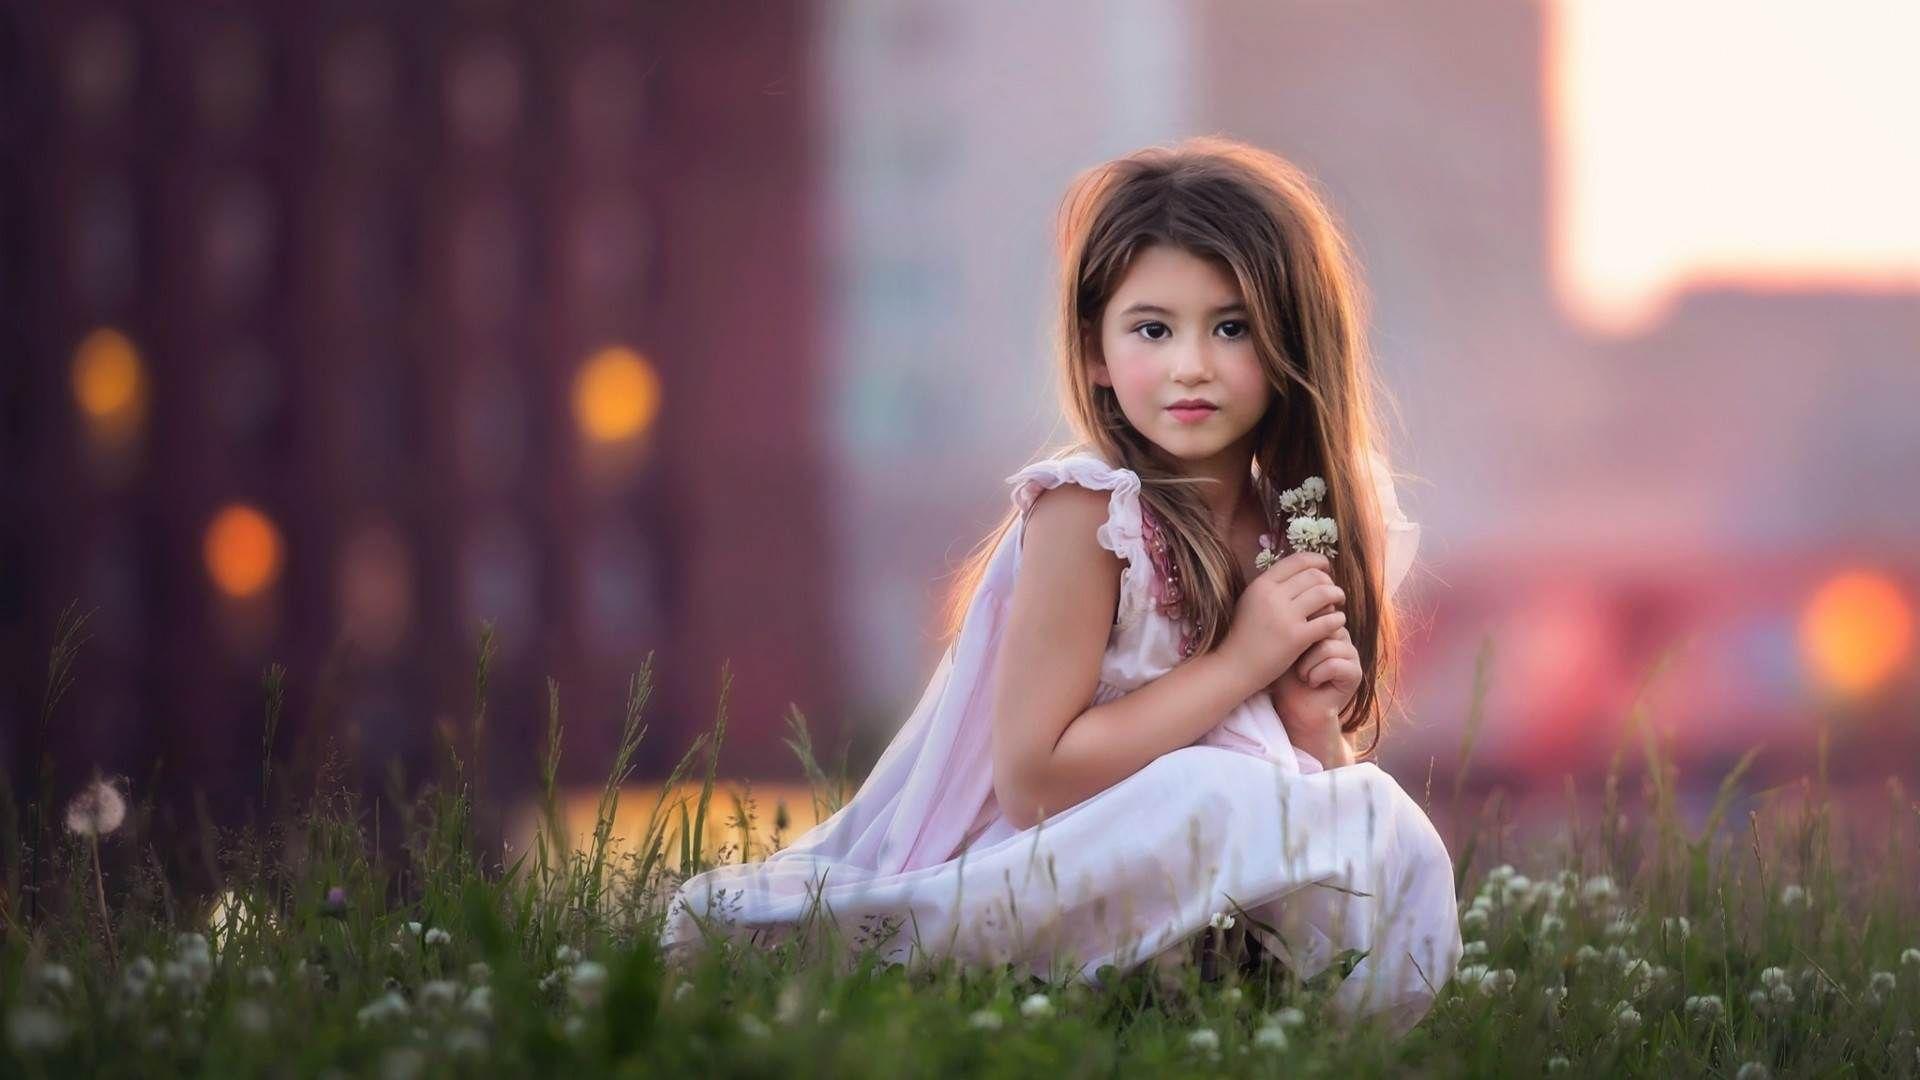 sweet girls wallpaper hd 1280×800 sweet girls pics | adorable